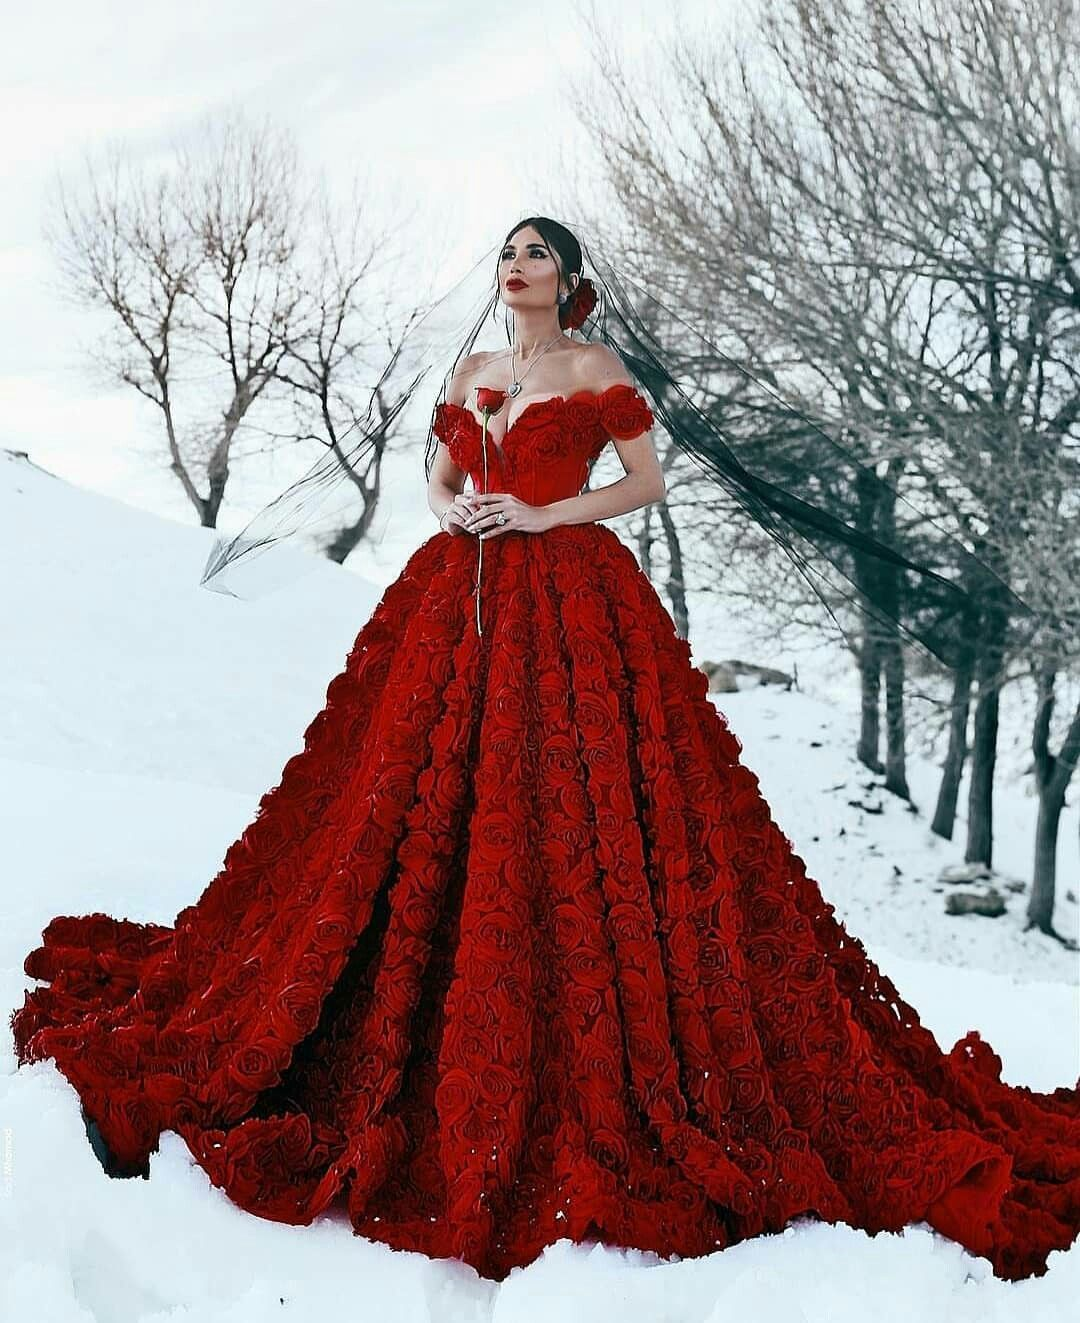 Wedding Red Dress Weddingdress Red Wedding Dresses Short Sleeve Wedding Dress Red Wedding Gowns